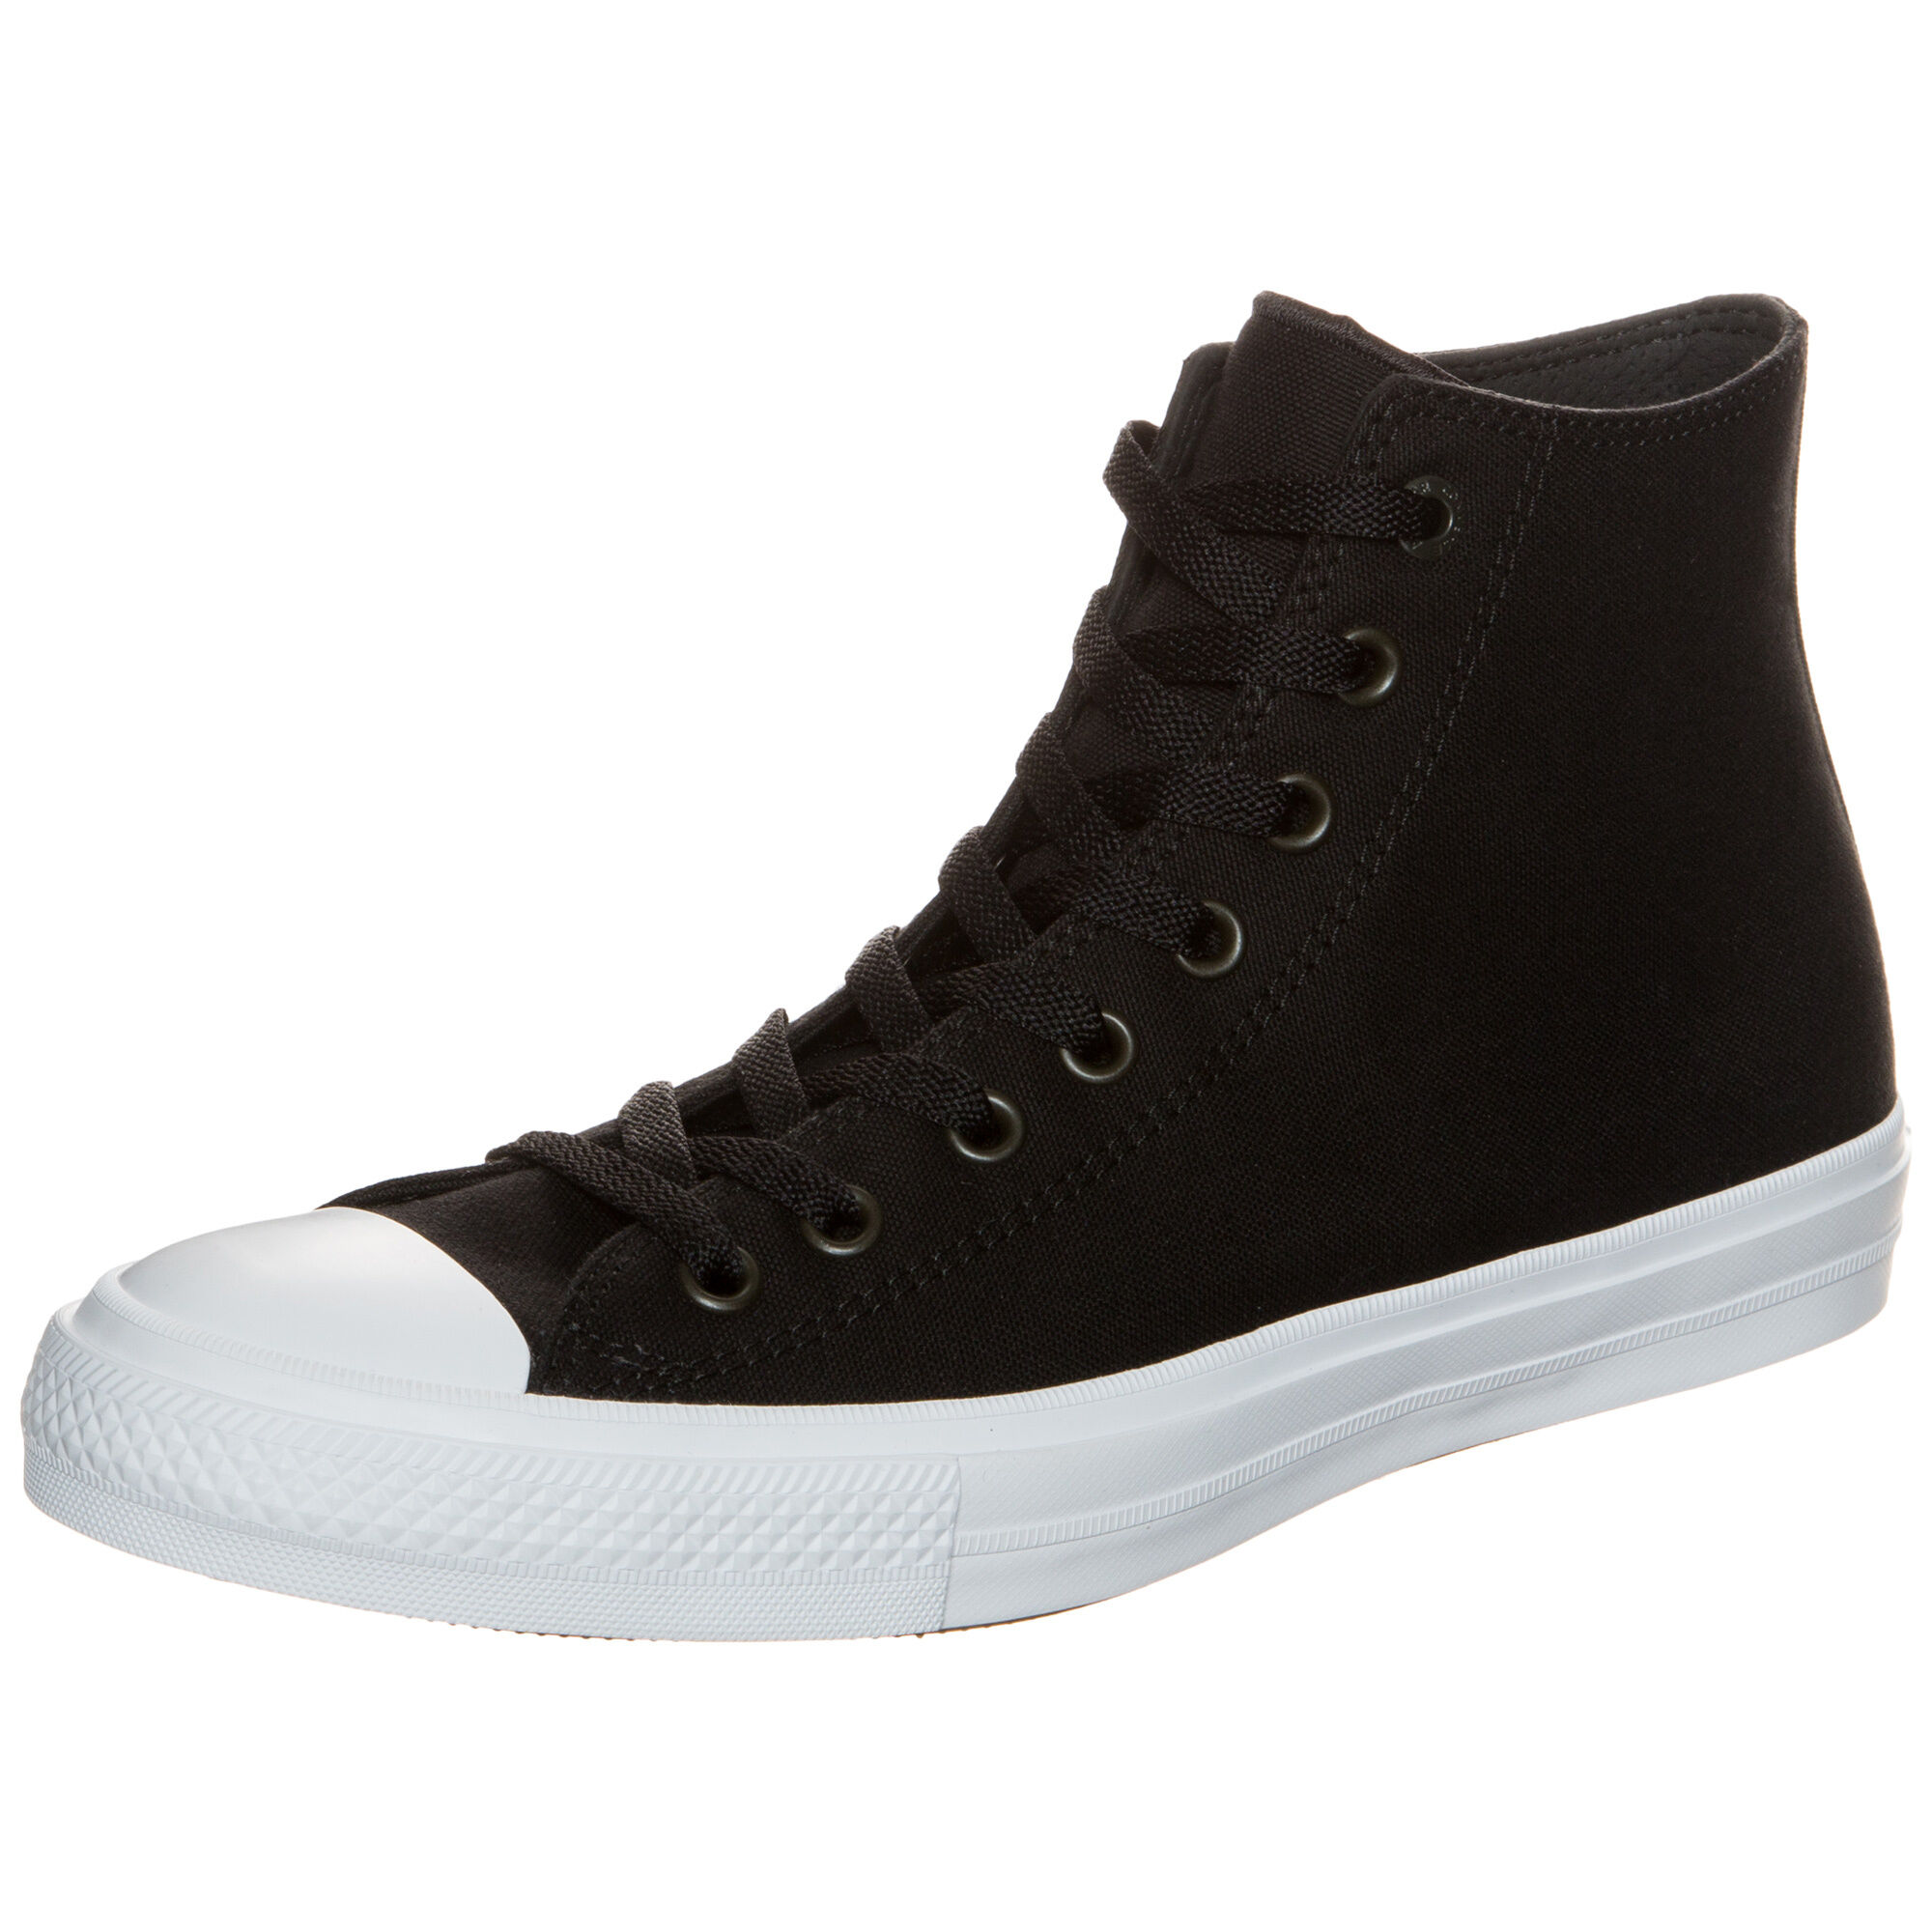 Converse Chuck Taylor All Star II High Sneaker bei OUTFITTER